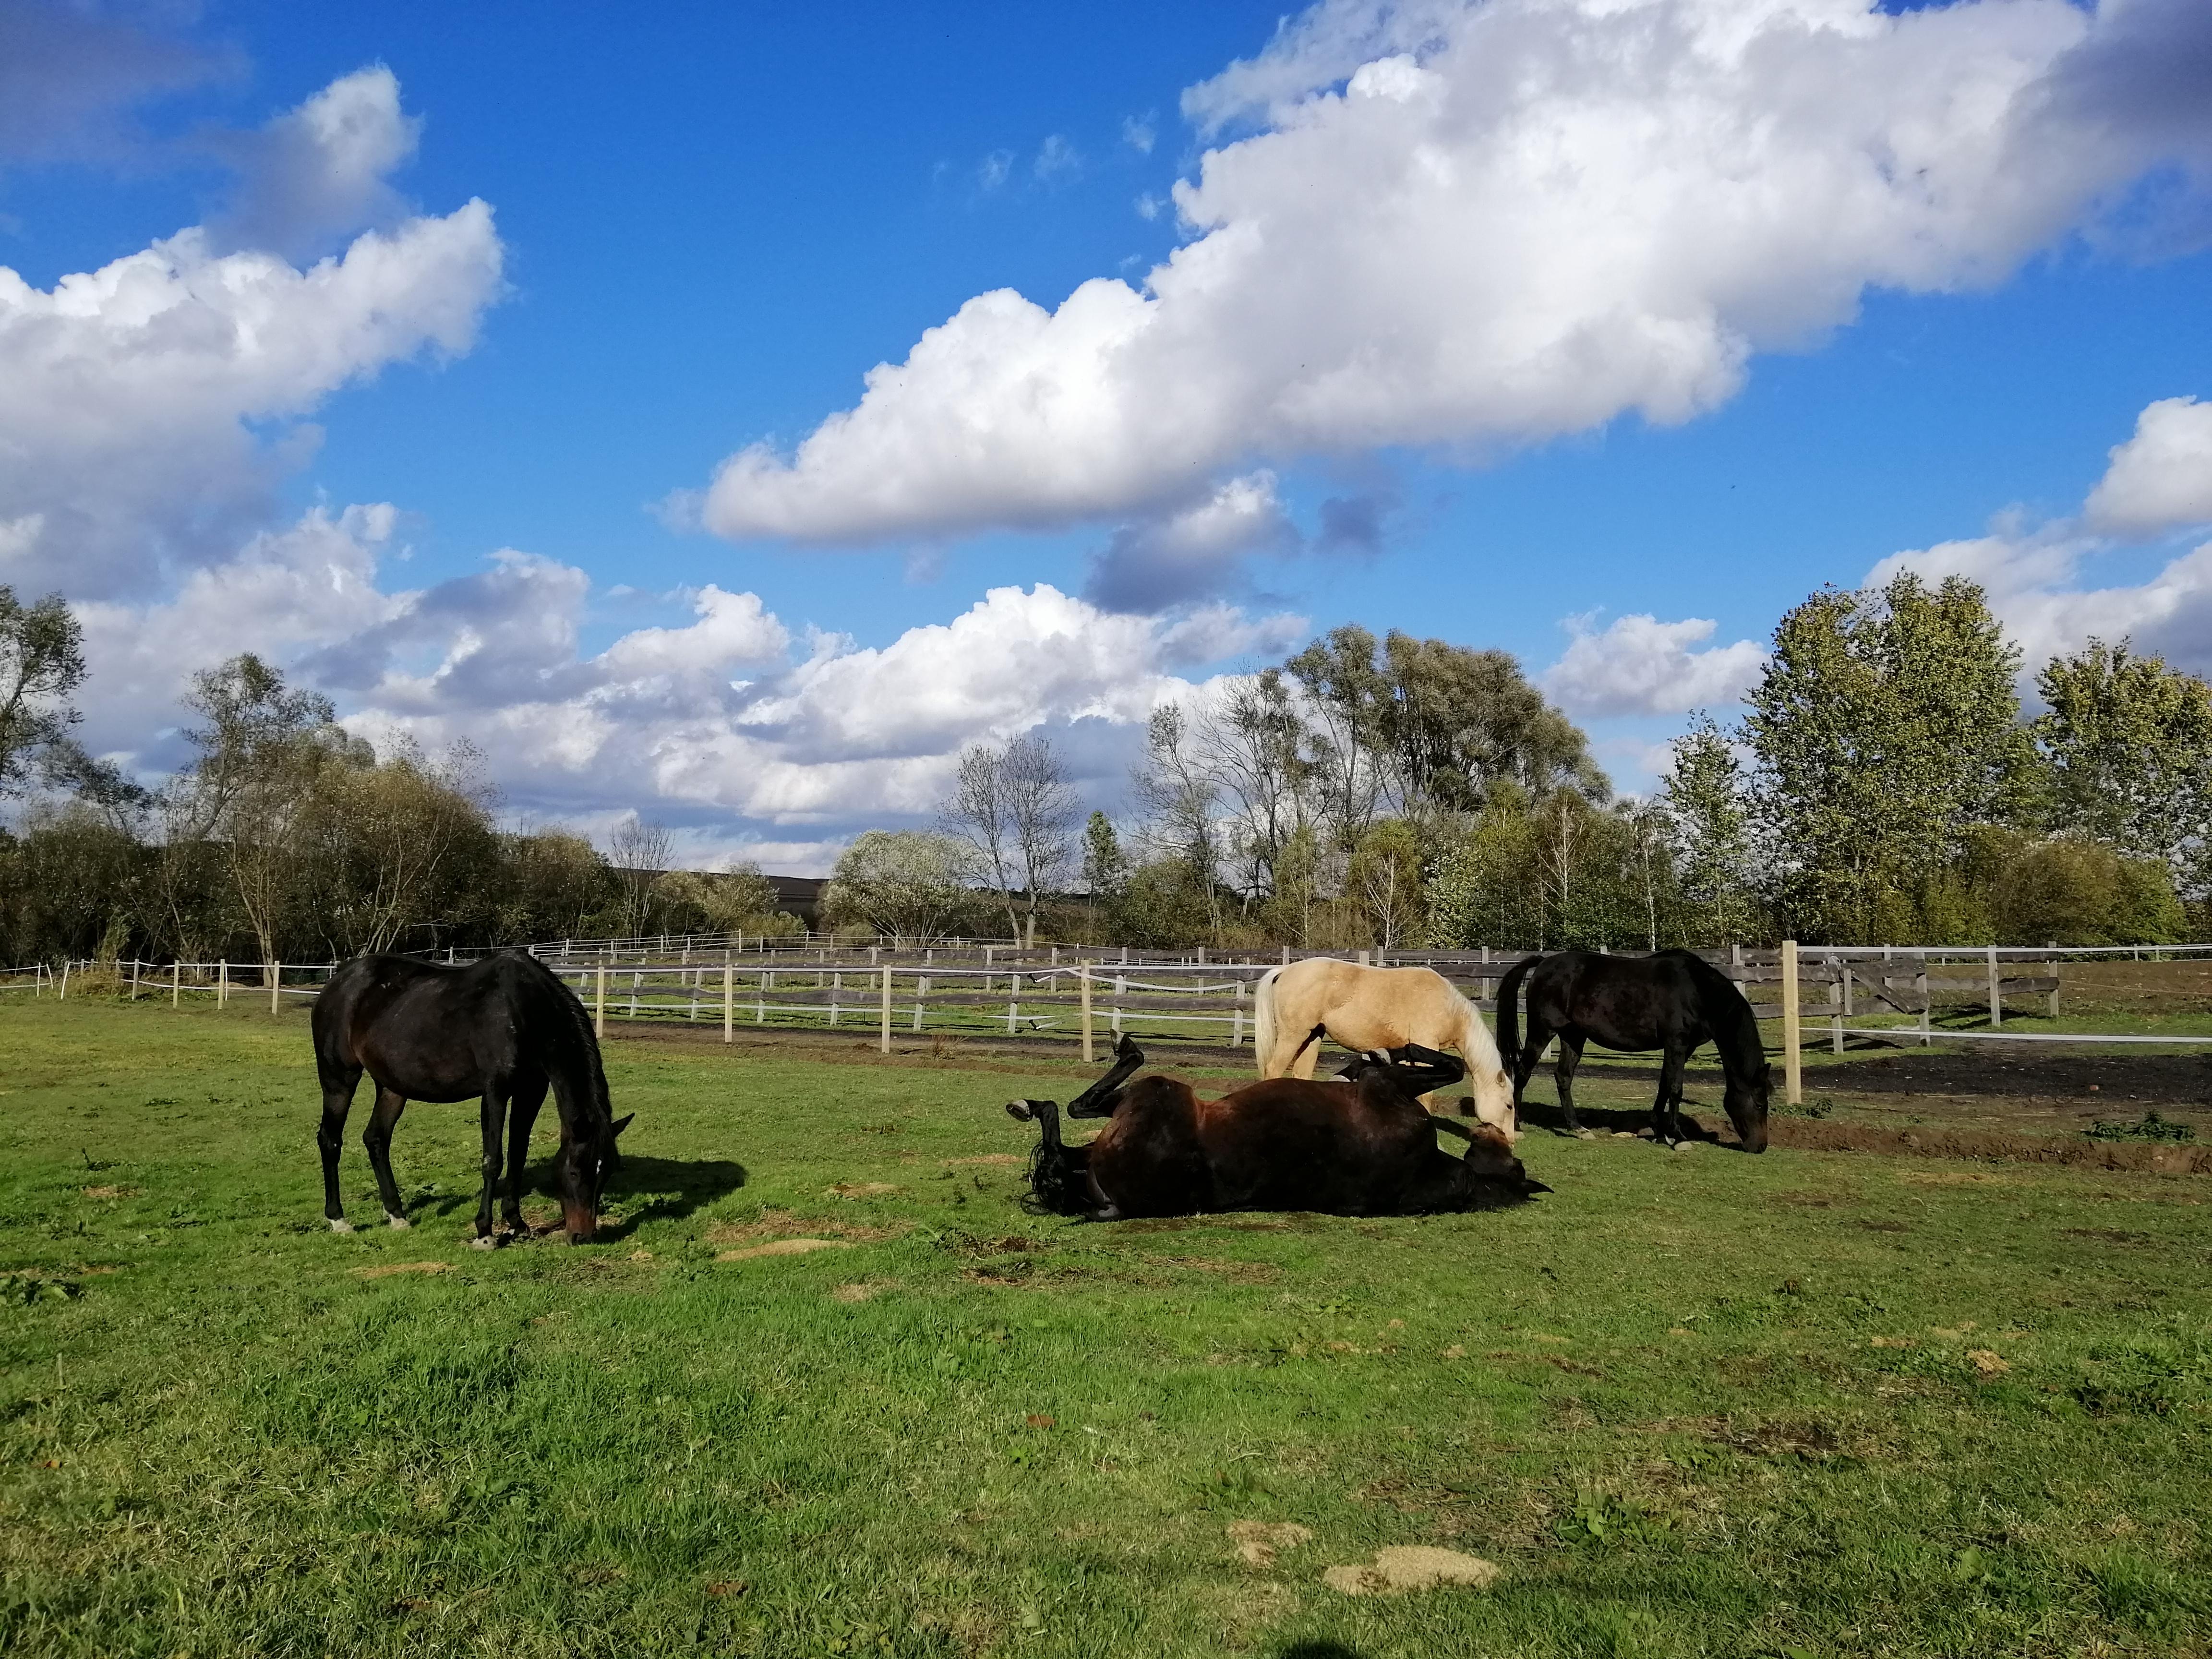 natura fizjoterapia koni manualna terapia konie Lubelskie natura jazdy konne jazda w terenie dornter